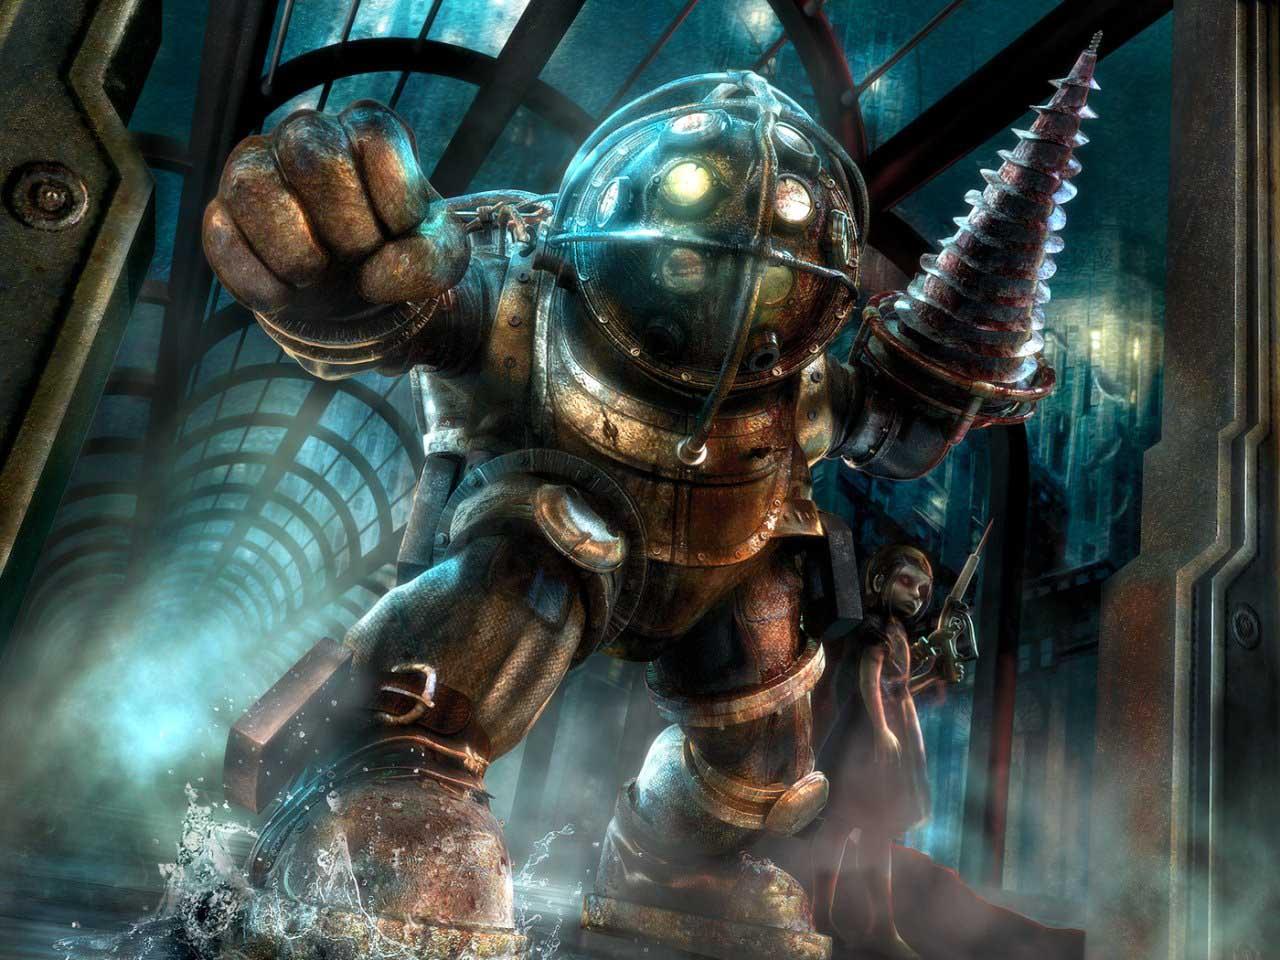 BioShock выходит на iOS совсем скоро